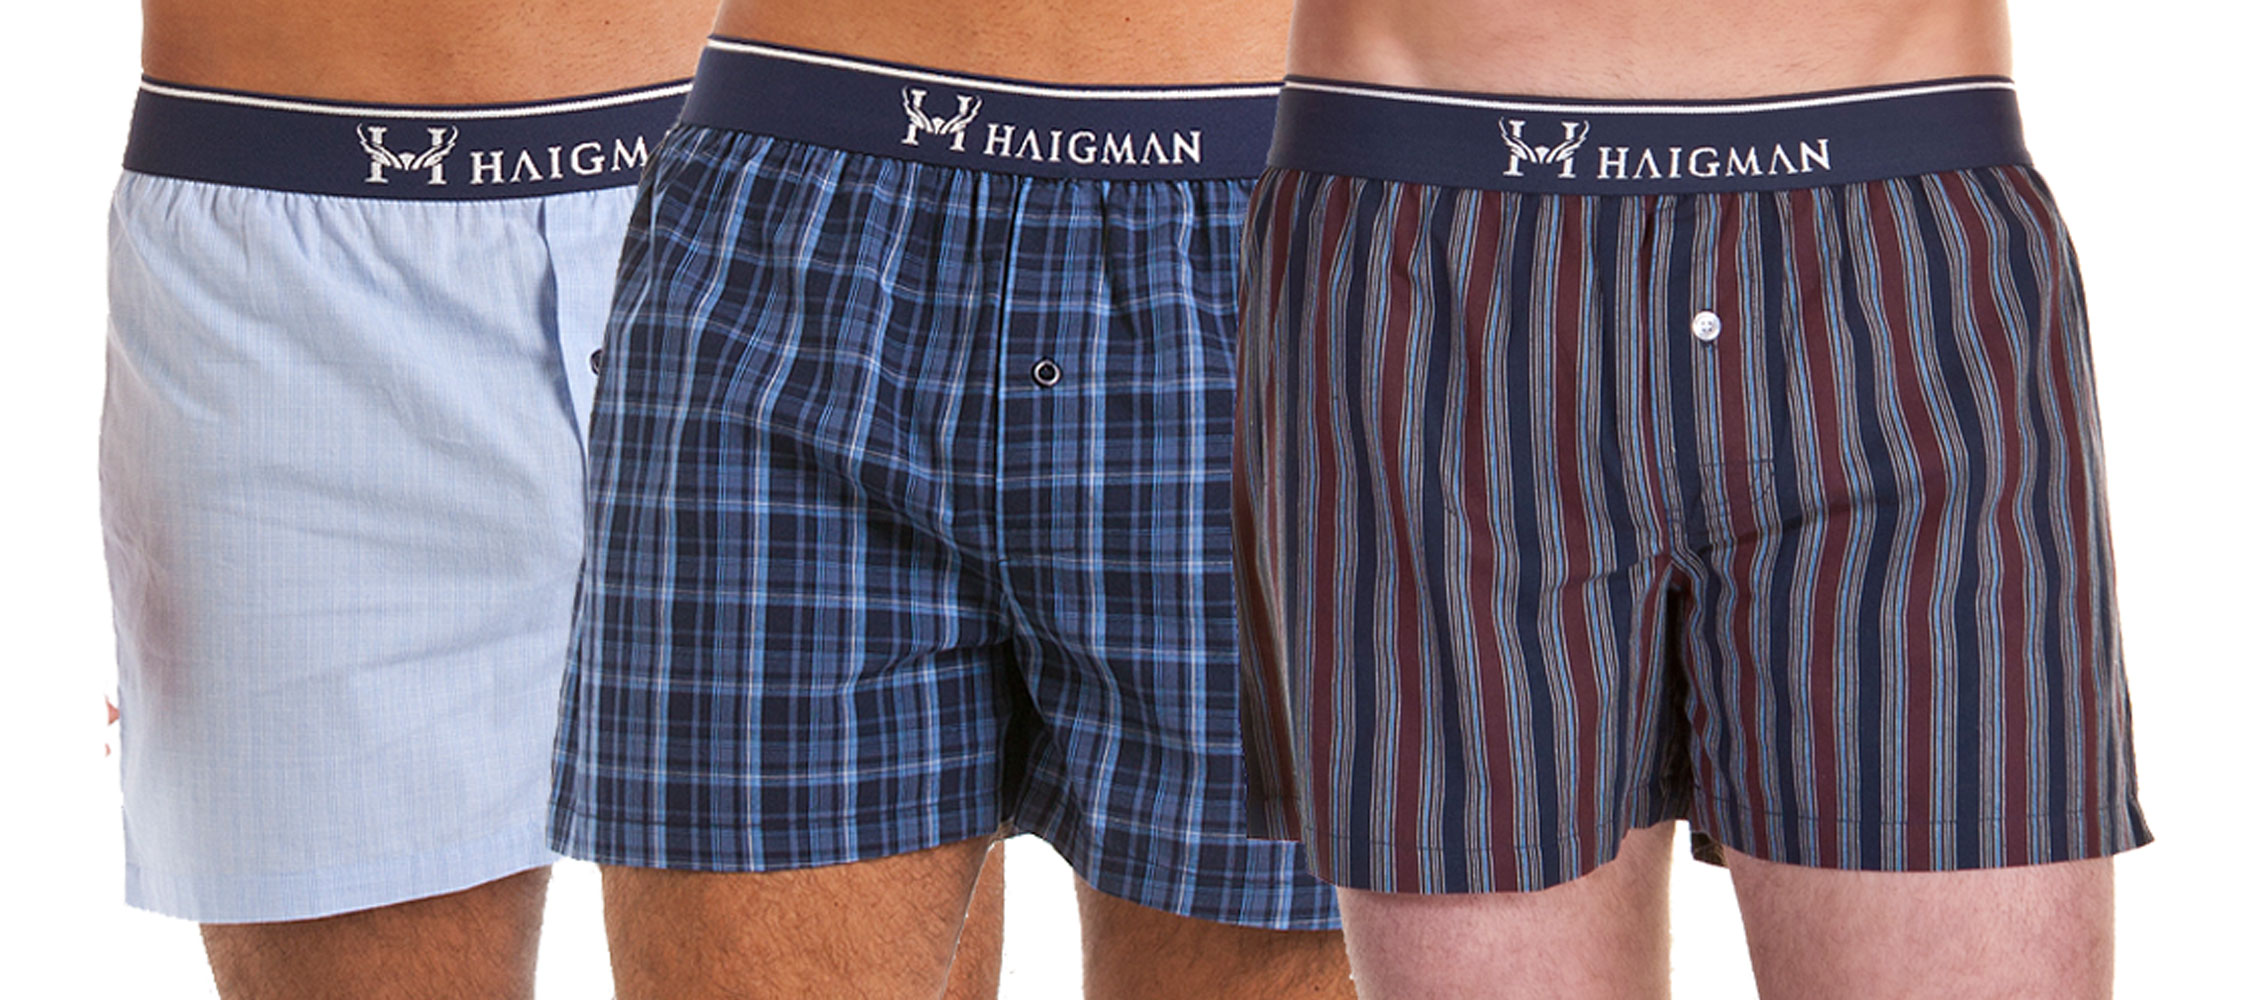 mens haigman woven printed 100 cotton boxer shorts underwear 6 pk ebay. Black Bedroom Furniture Sets. Home Design Ideas